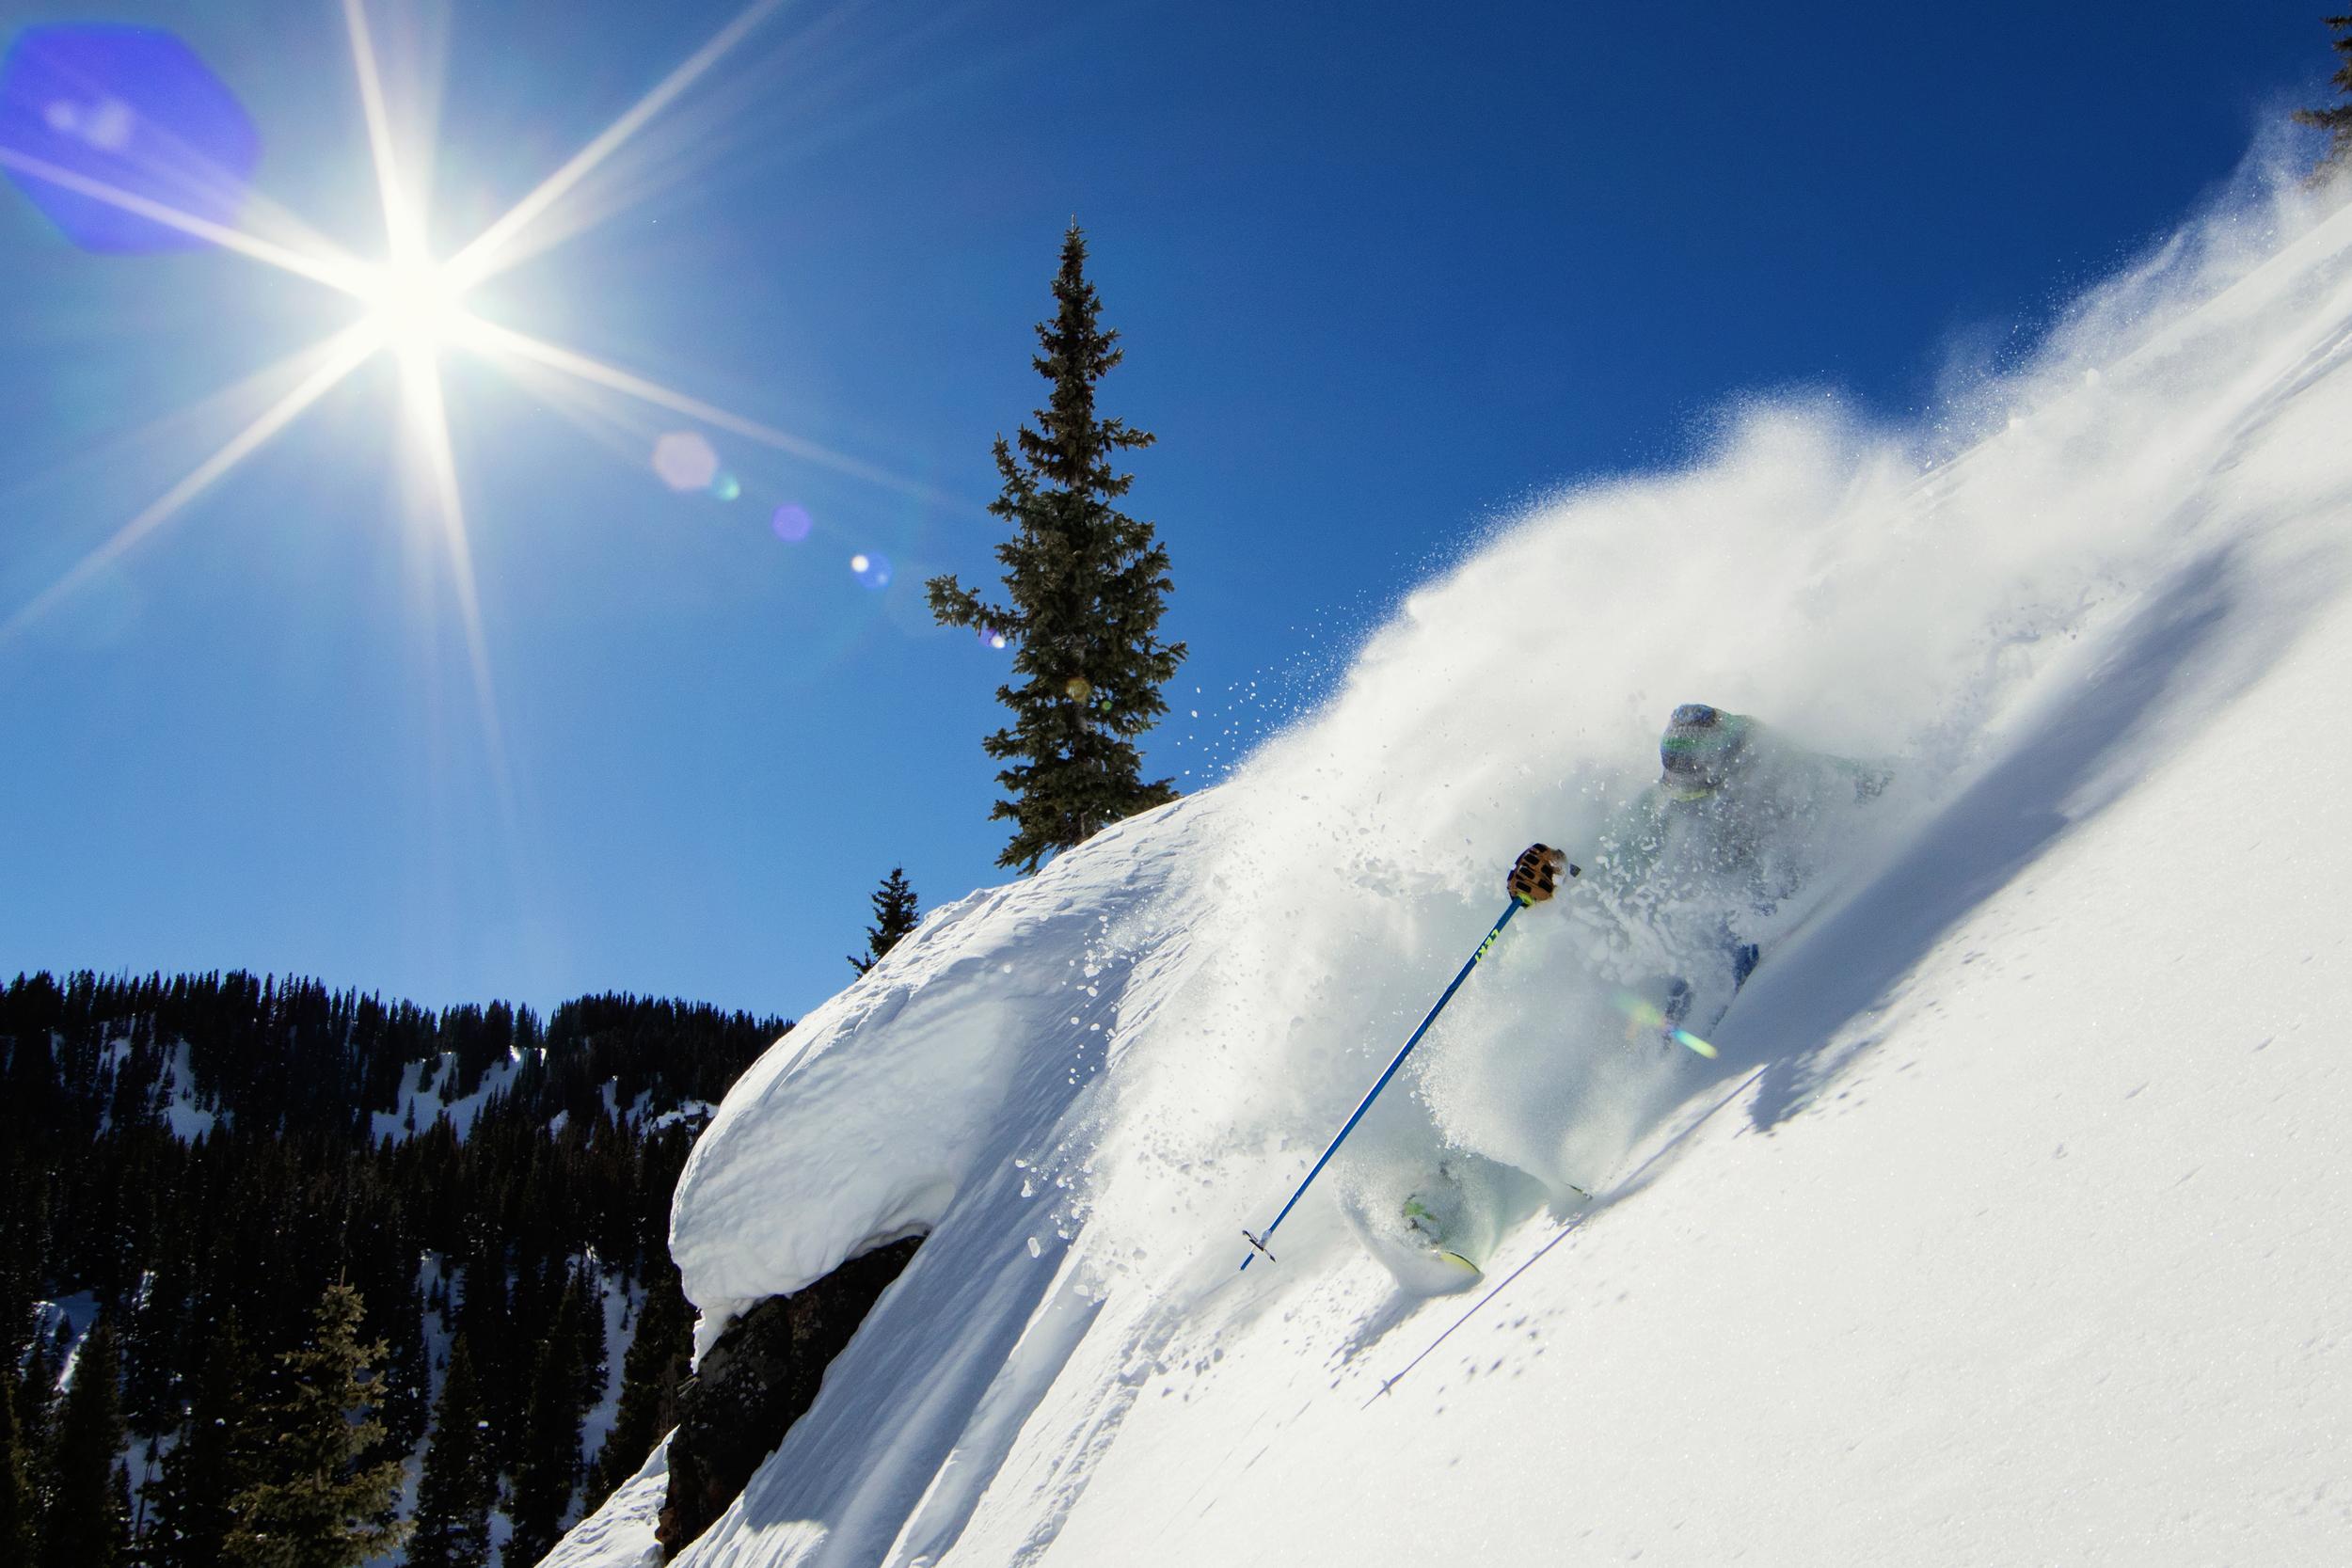 MattBerkowitz_photography_Skiing_Powder_Sven_2500px.jpg